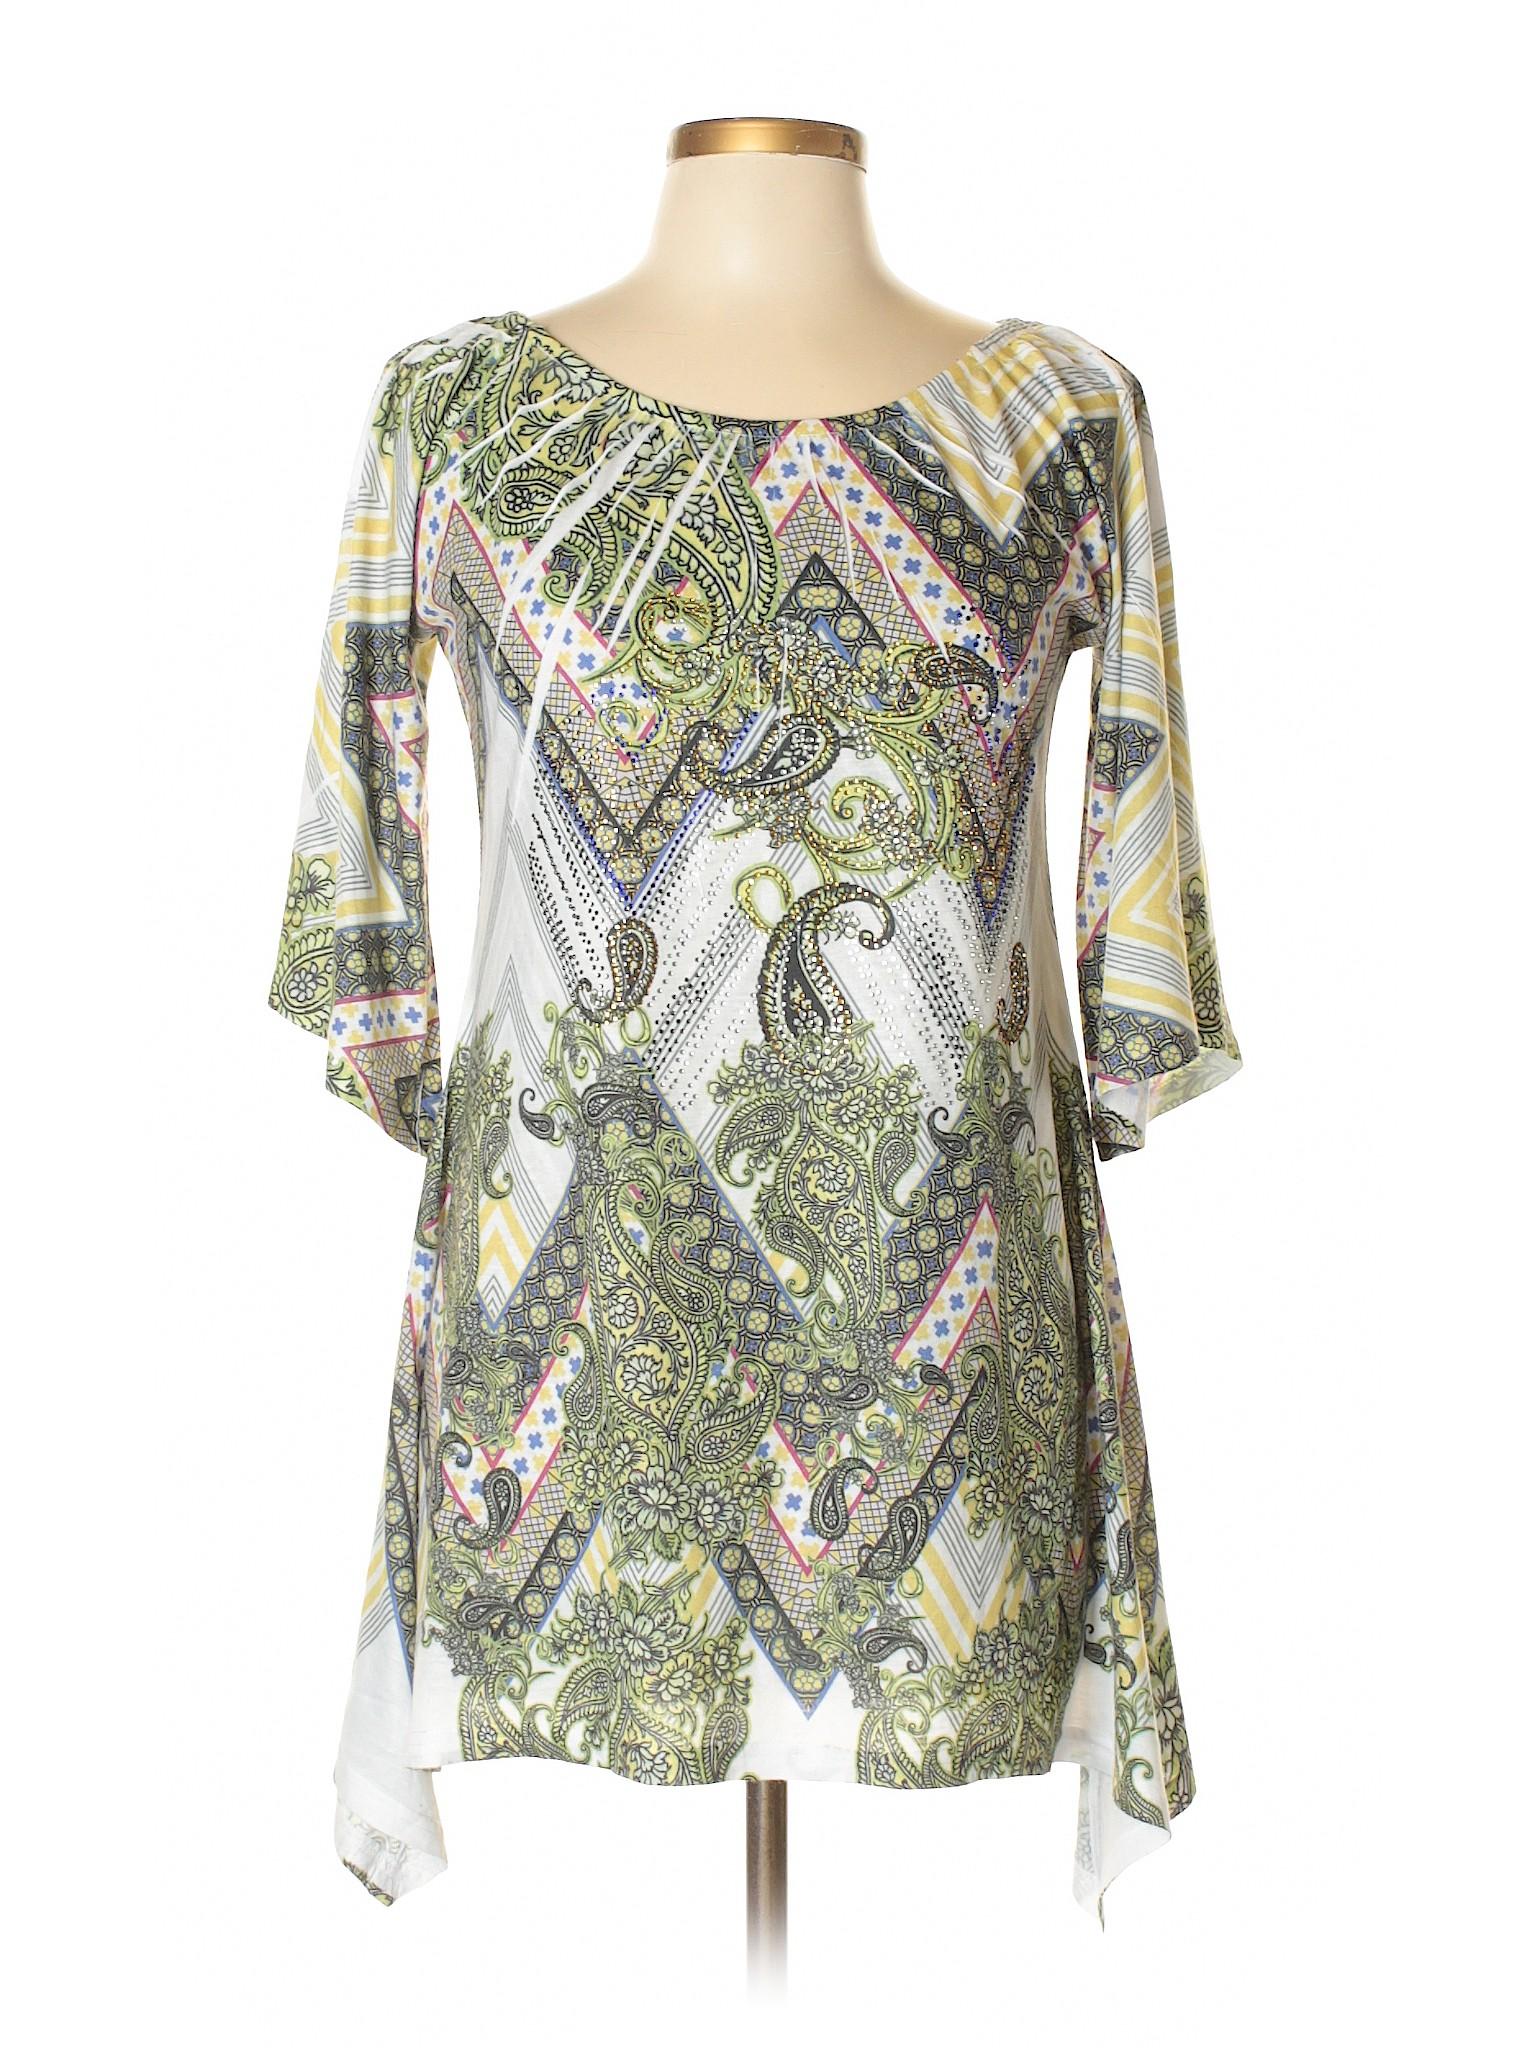 Casual Boutique Dress Dress Bacci Bacci Casual winter Boutique Boutique winter winter ZwqqCTP